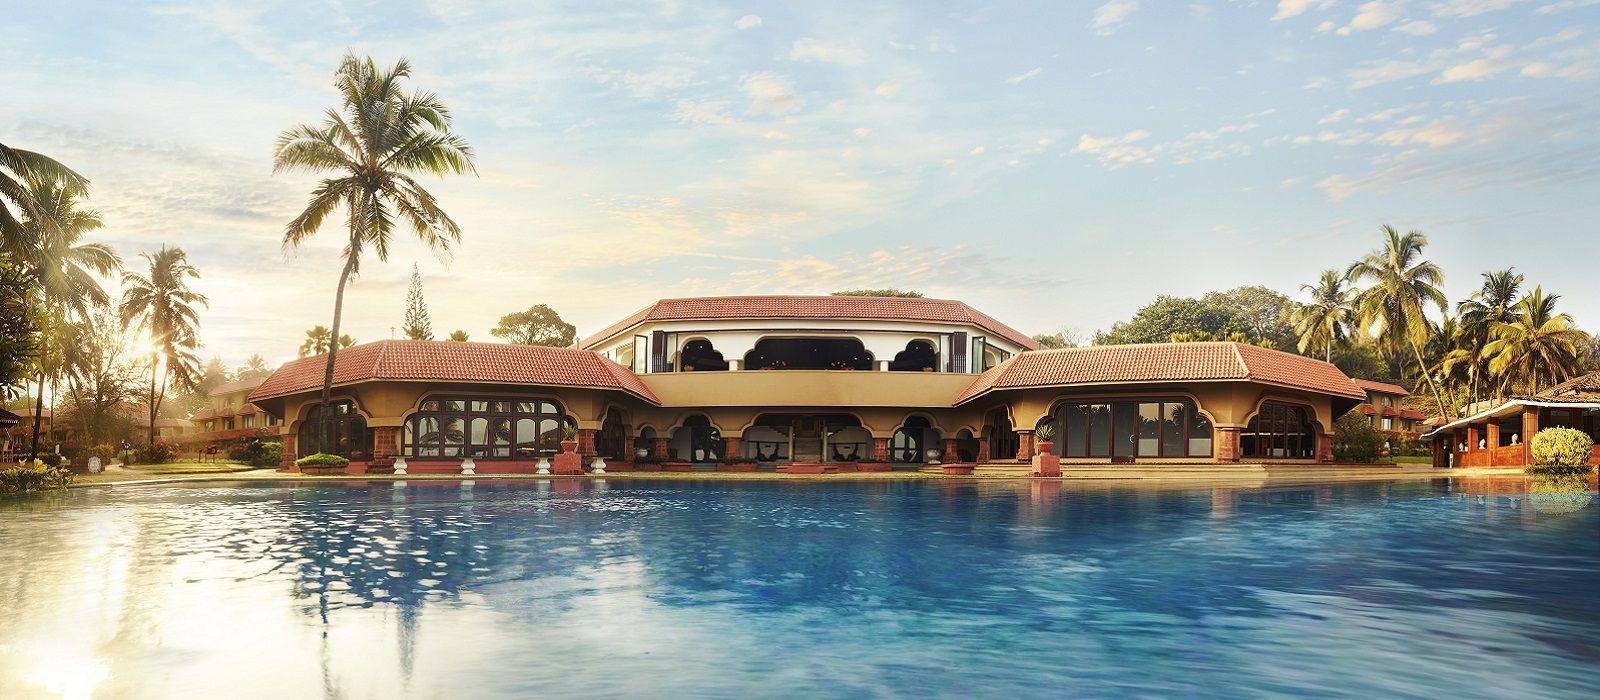 Hotel Taj Fort Aguada Resort & Spa Islands & Beaches